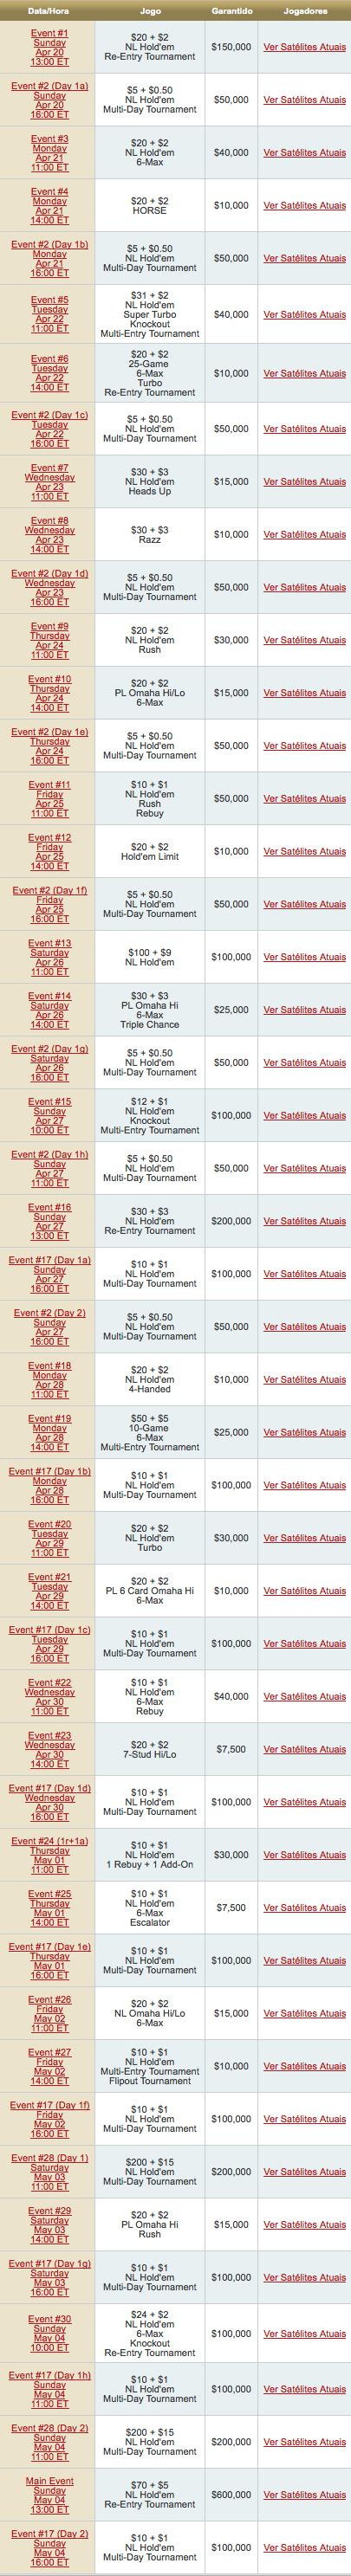 MiniFTOPS XXV - 20 de Abril a 5 de Maio na Full Tilt Poker 101